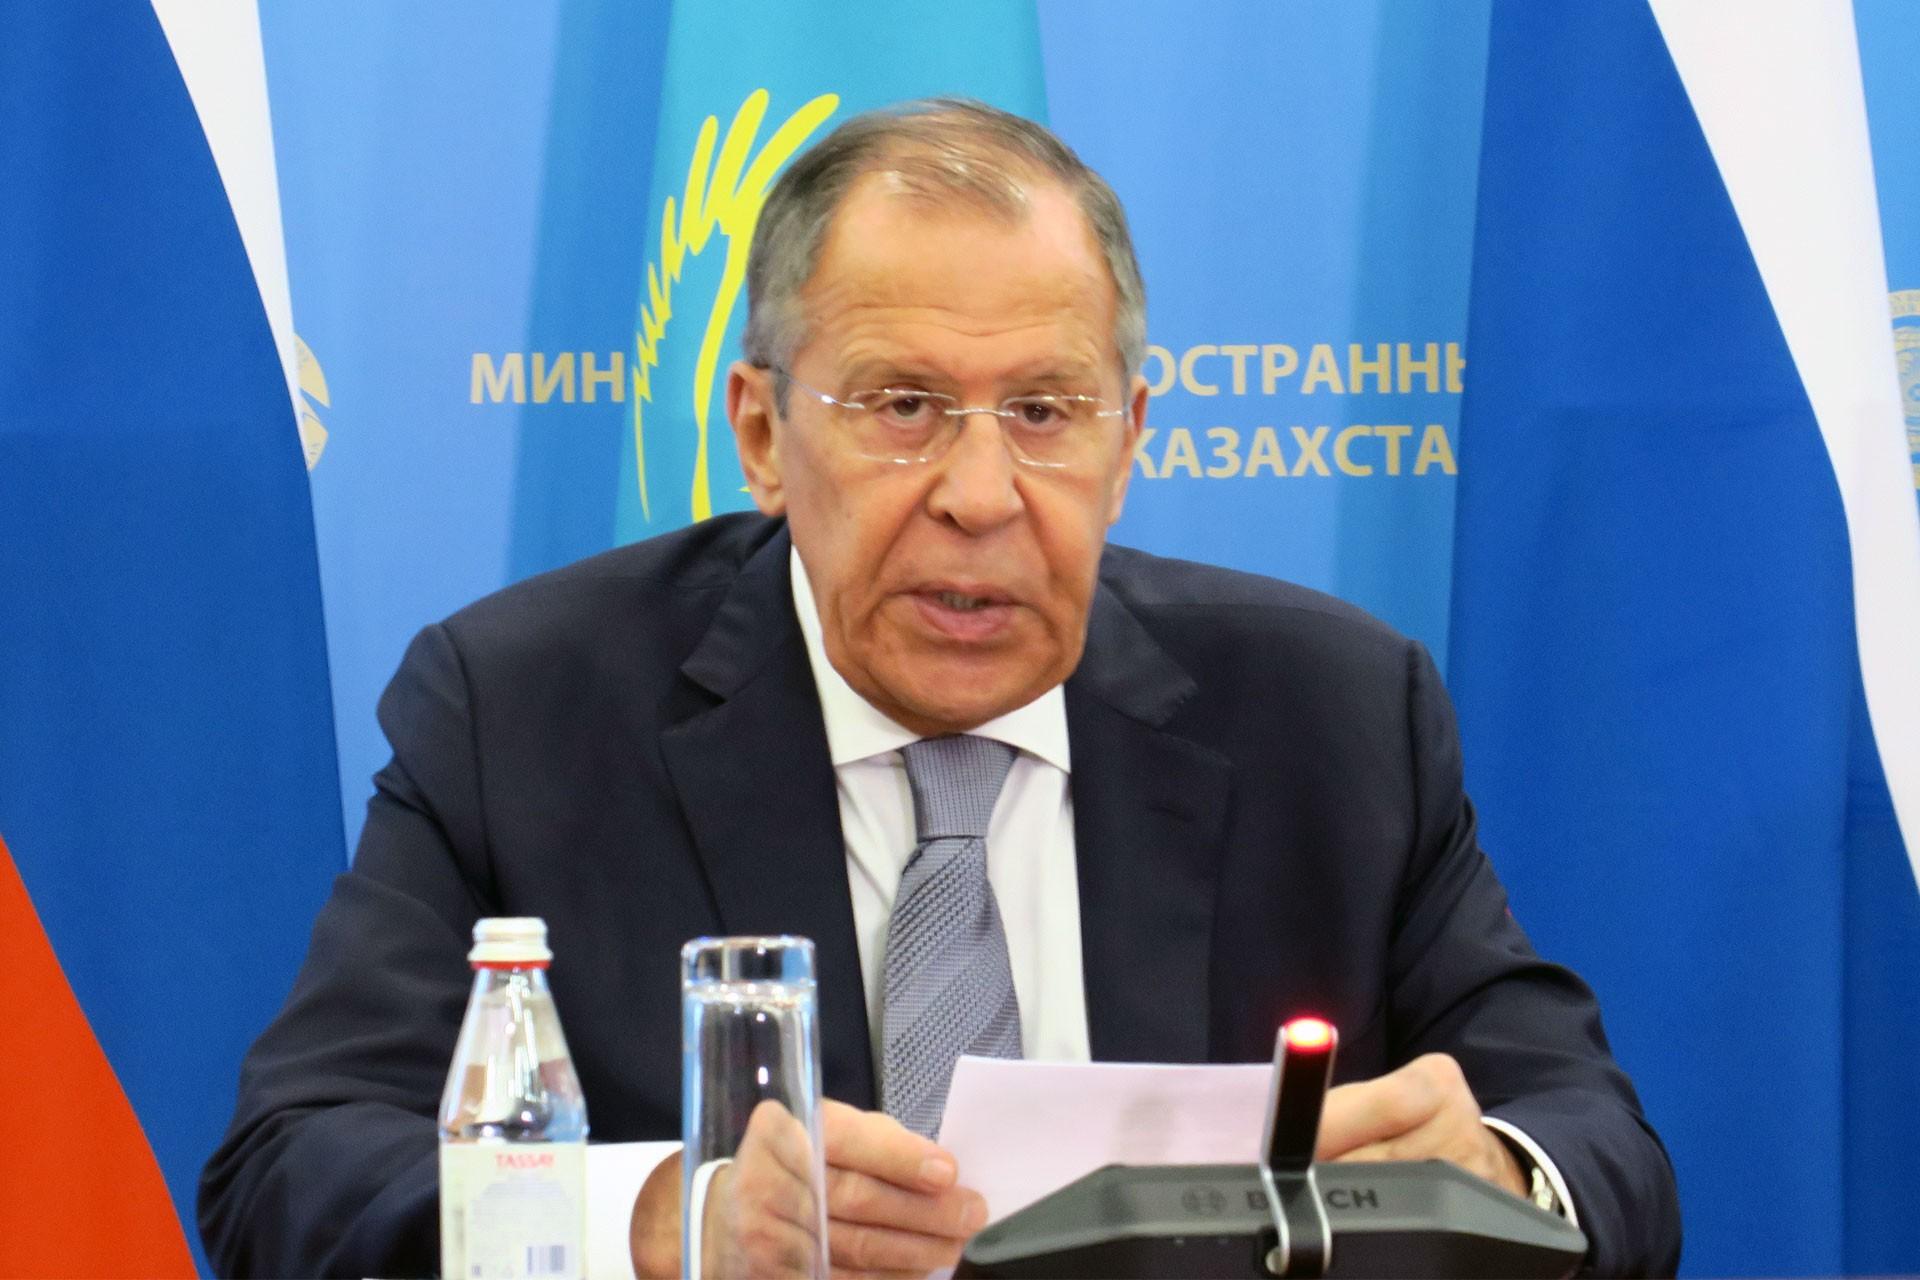 SDG, Rusya'nın Şam'la diyalog çağrısından memnun